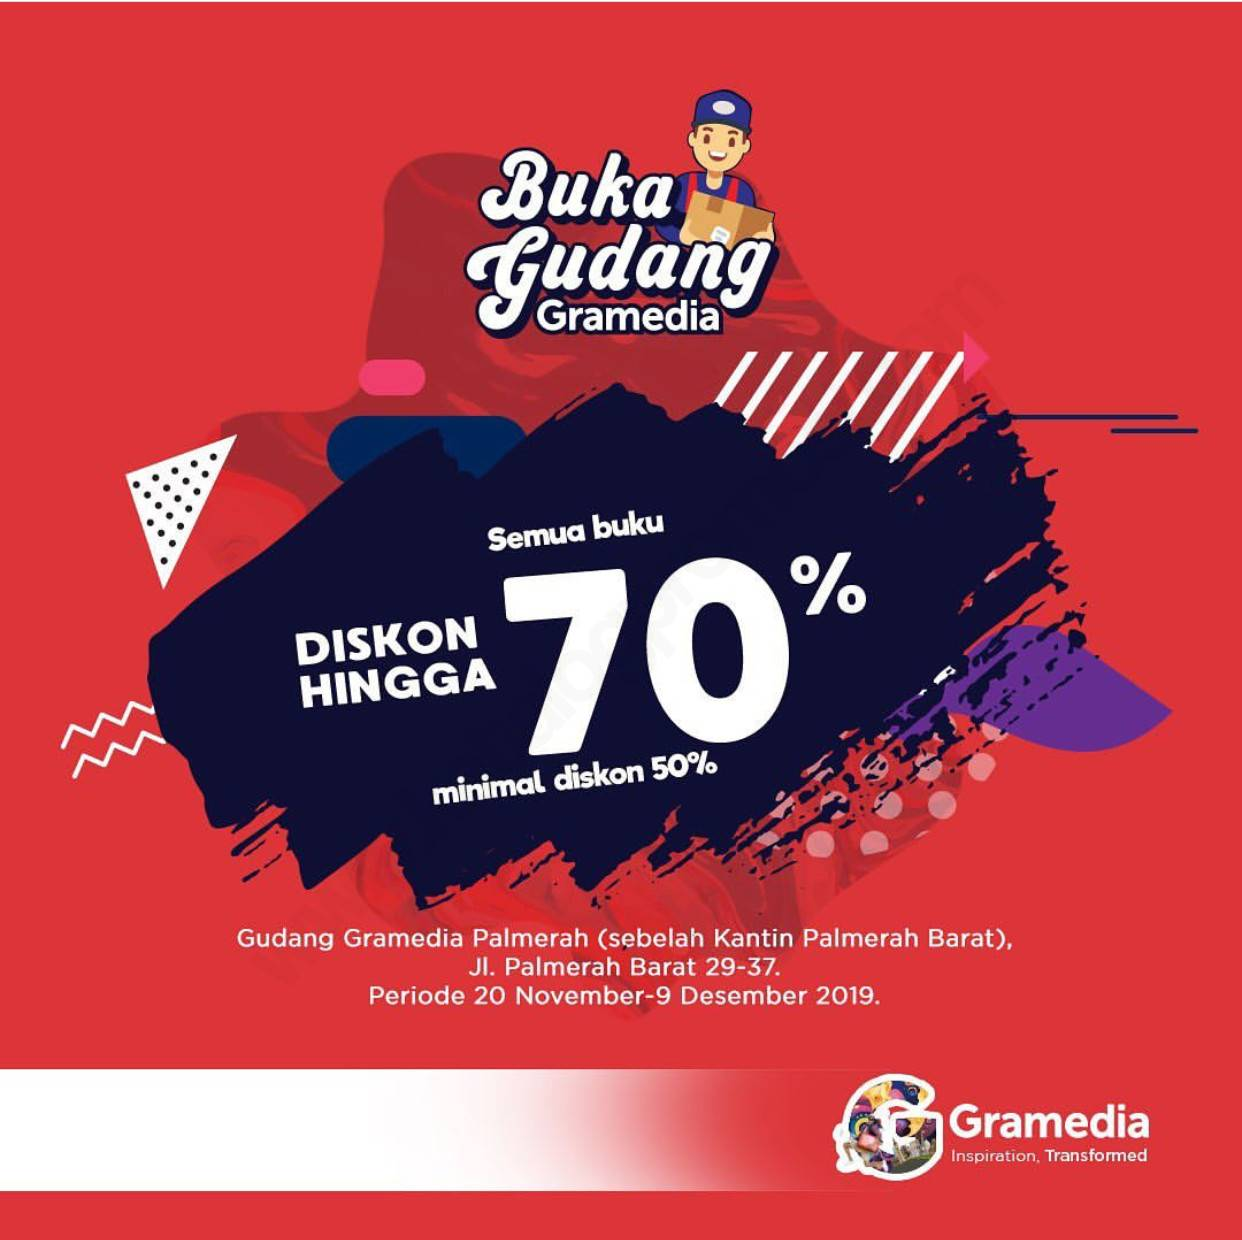 Gramedia Promo Buka Gudang Diskon hingga 70% di Gramedia Palmerah